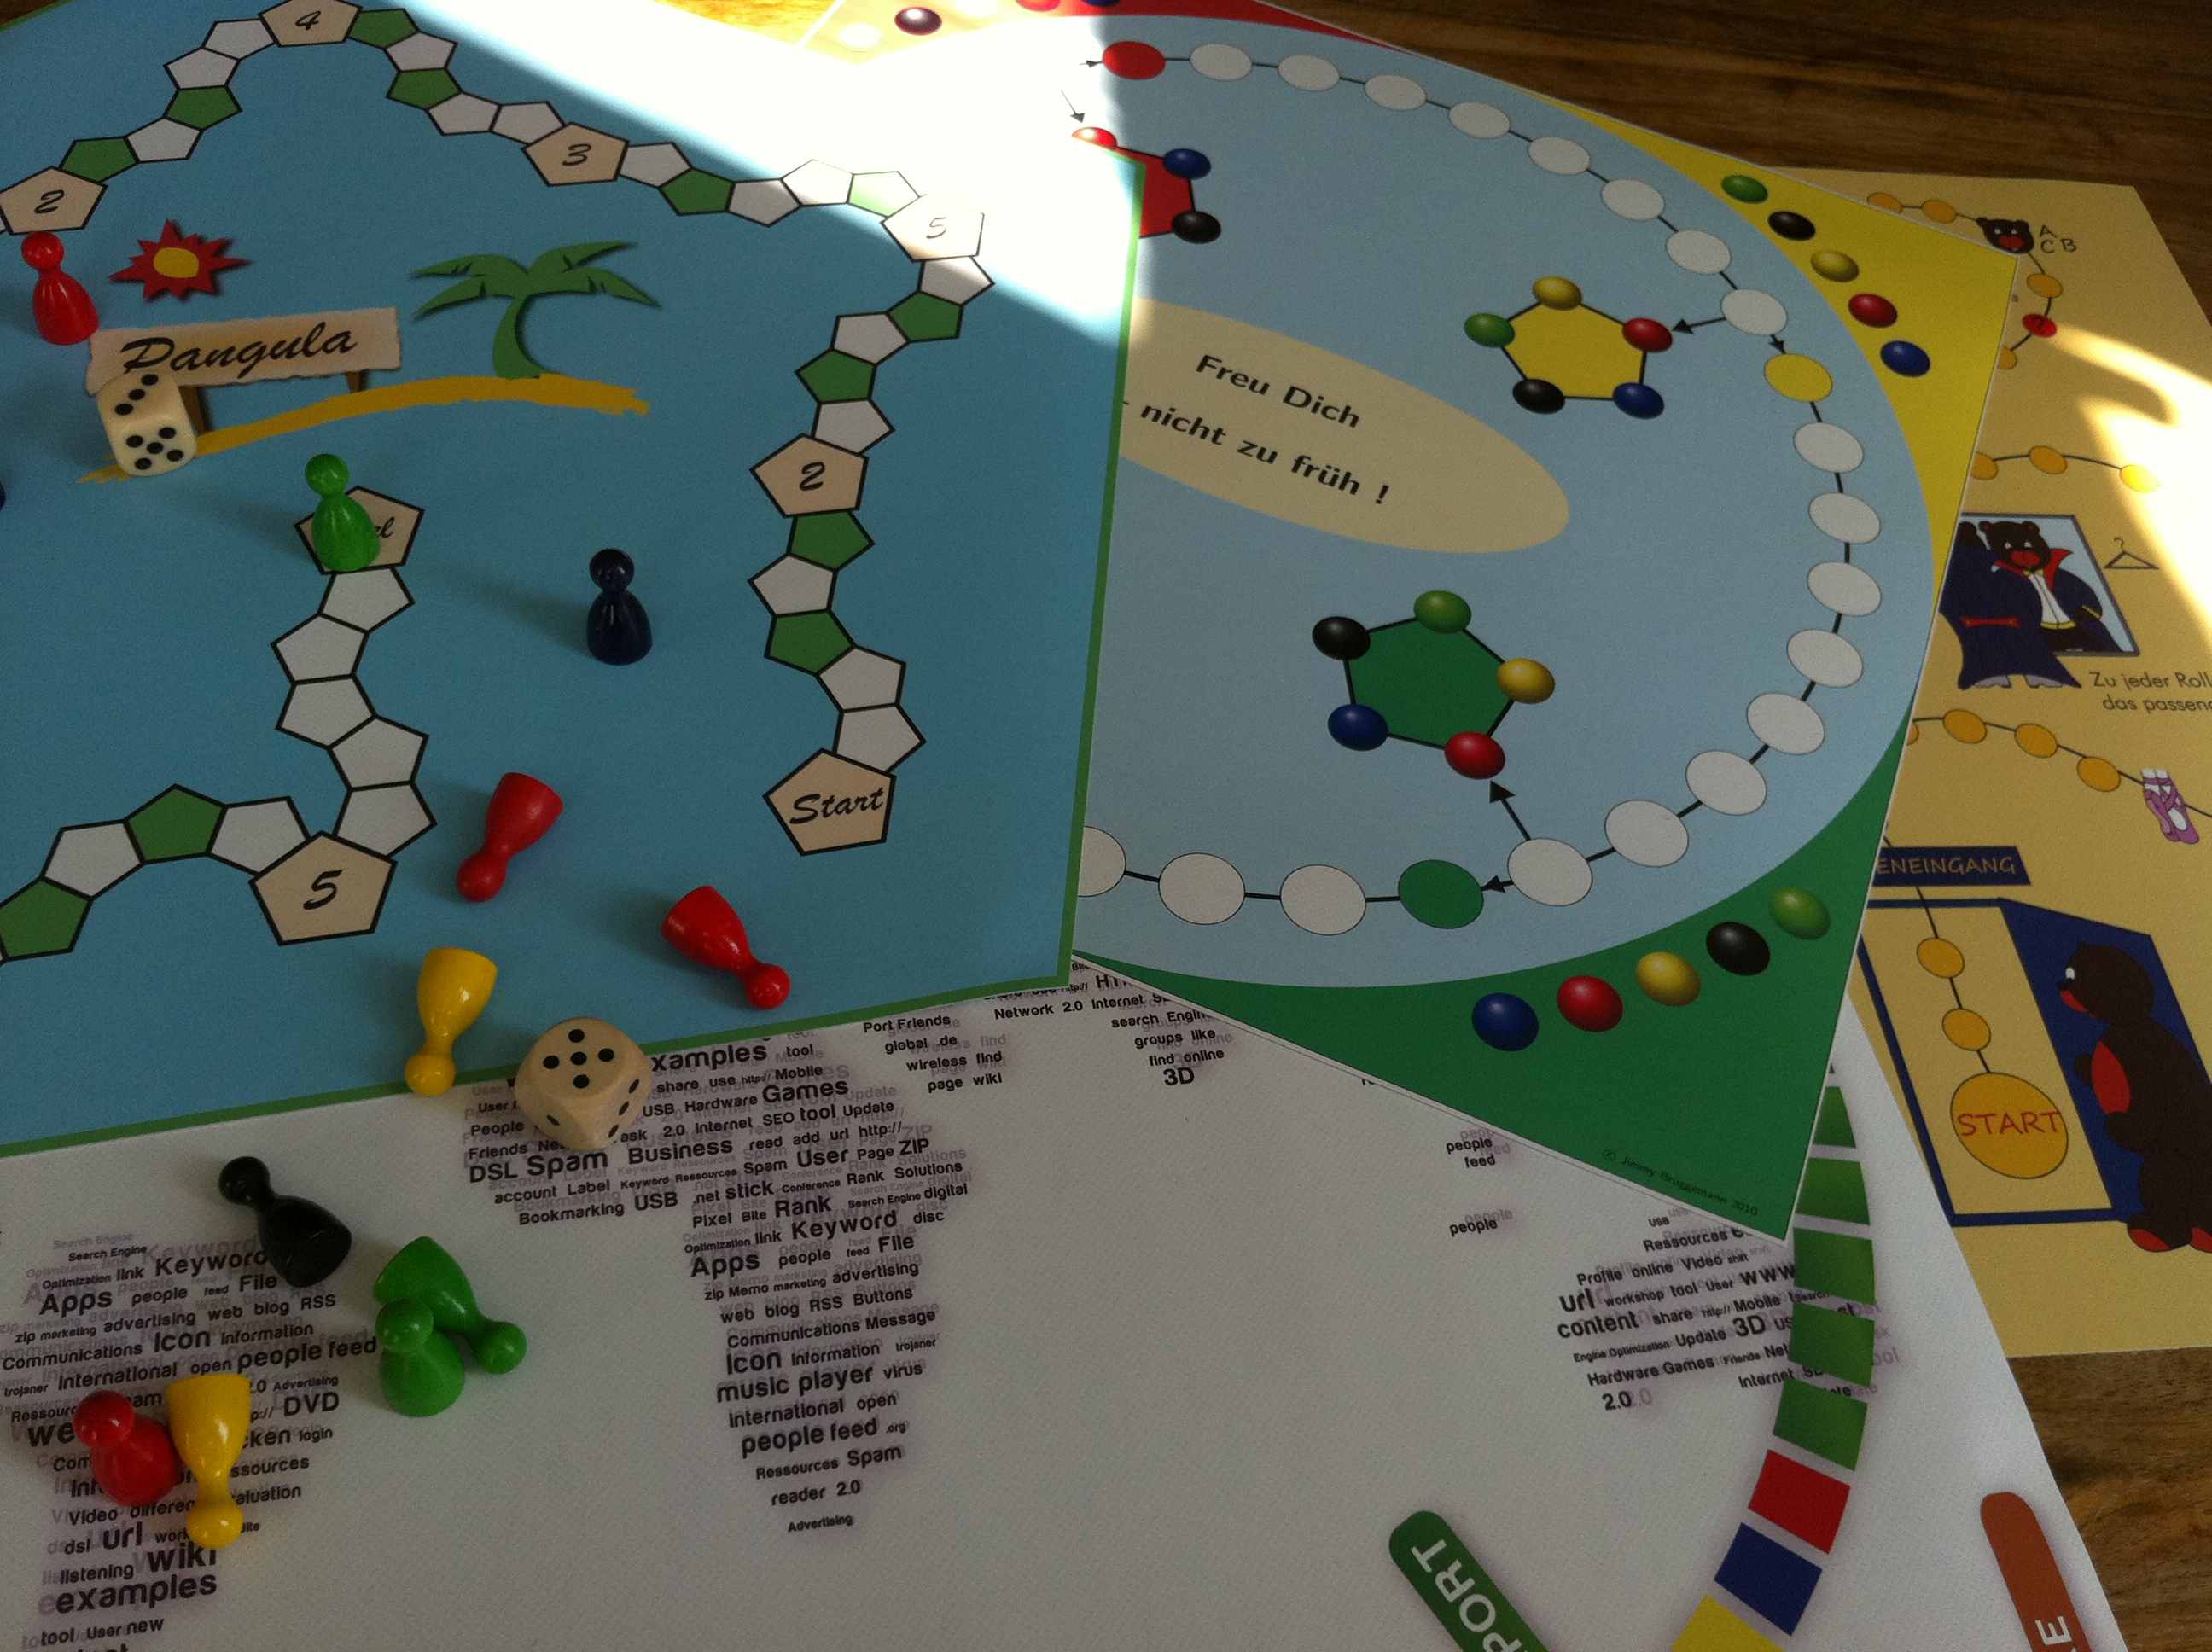 Brettspiel erstellen schulprojekt schule spiele ideen - Schulprojekte ideen ...